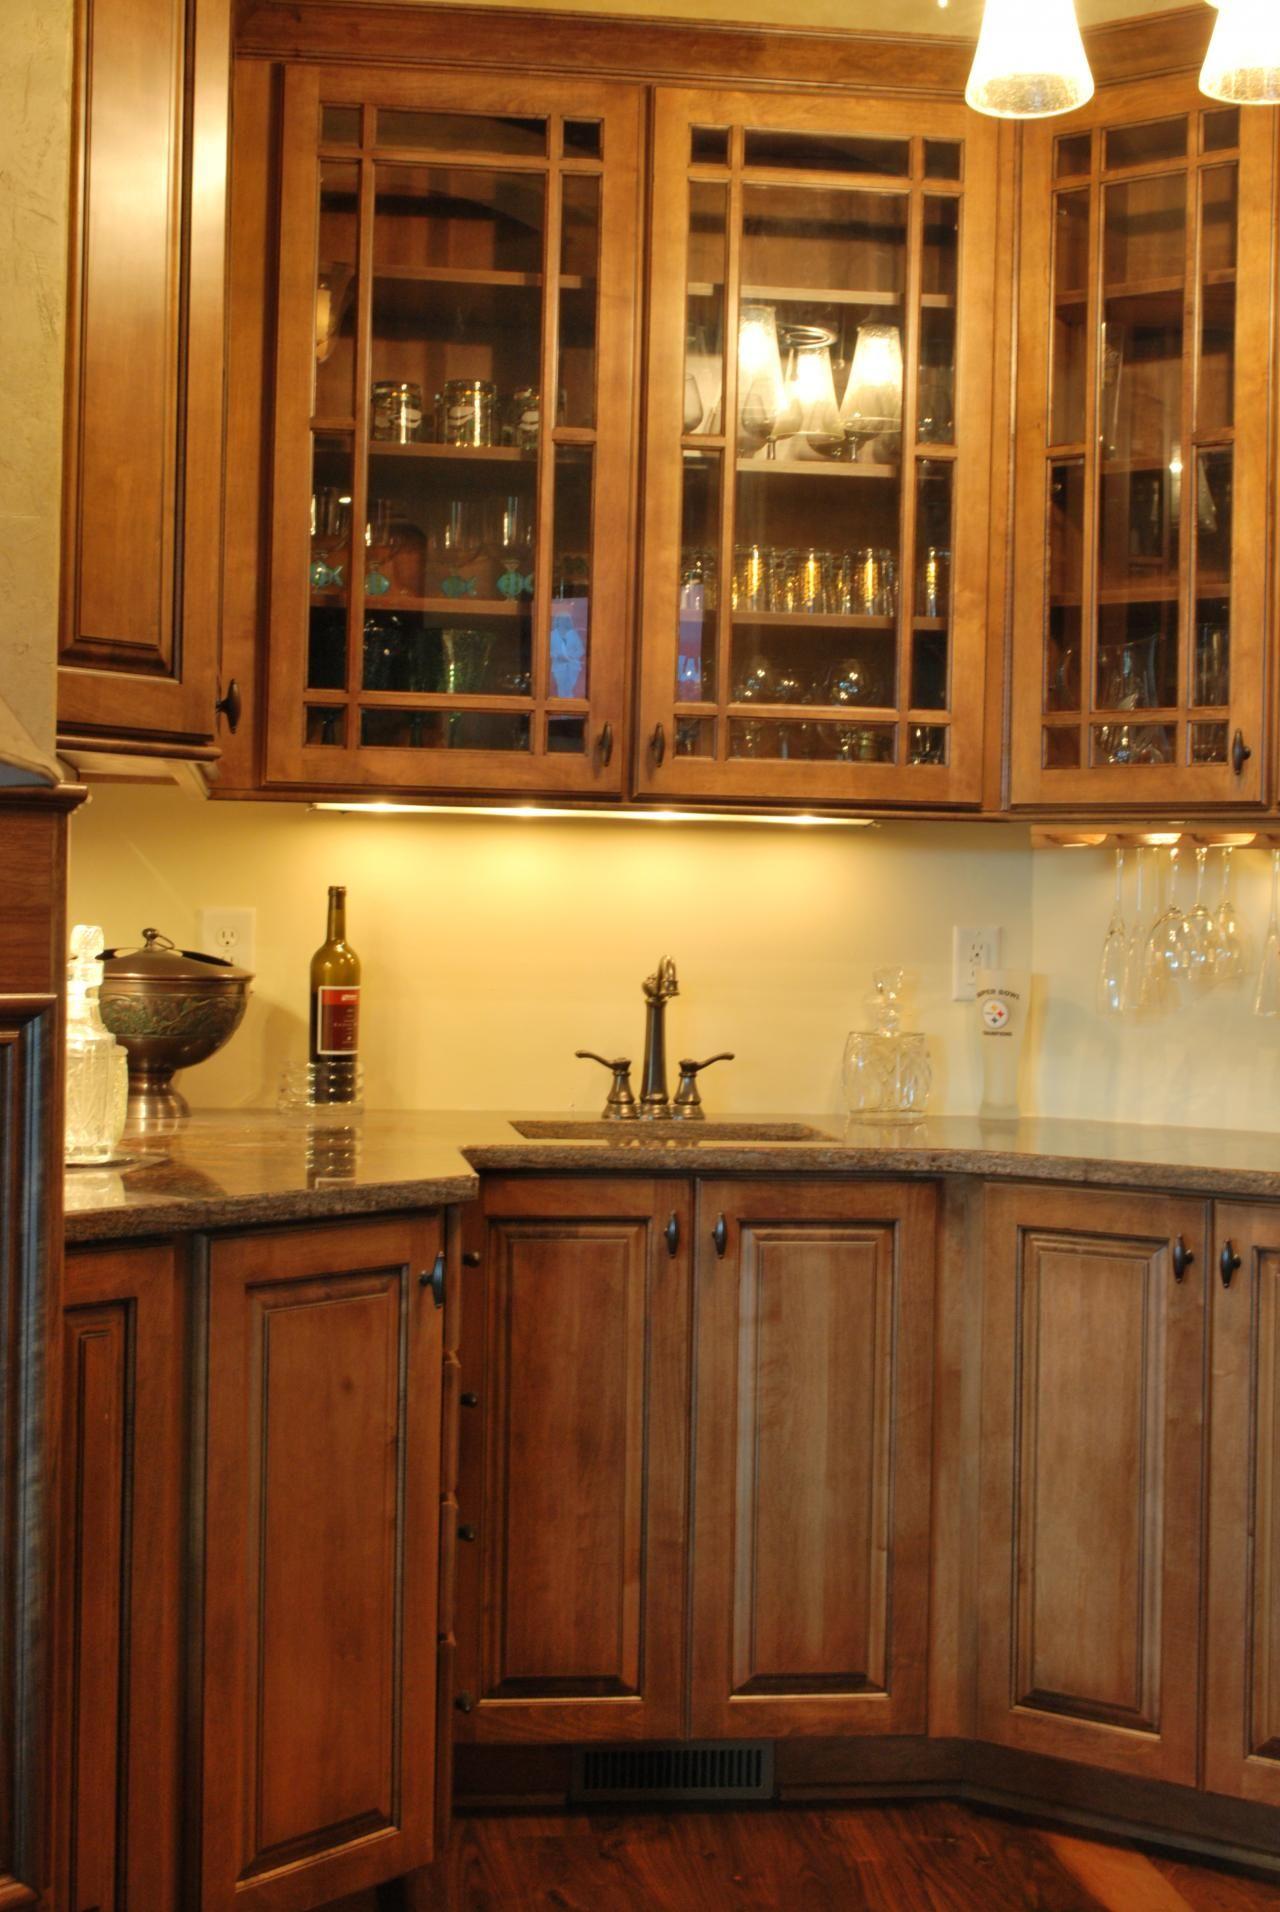 Shiloh Cabinetry | Shiloh cabinetry, Cabinetry, Kitchen ...